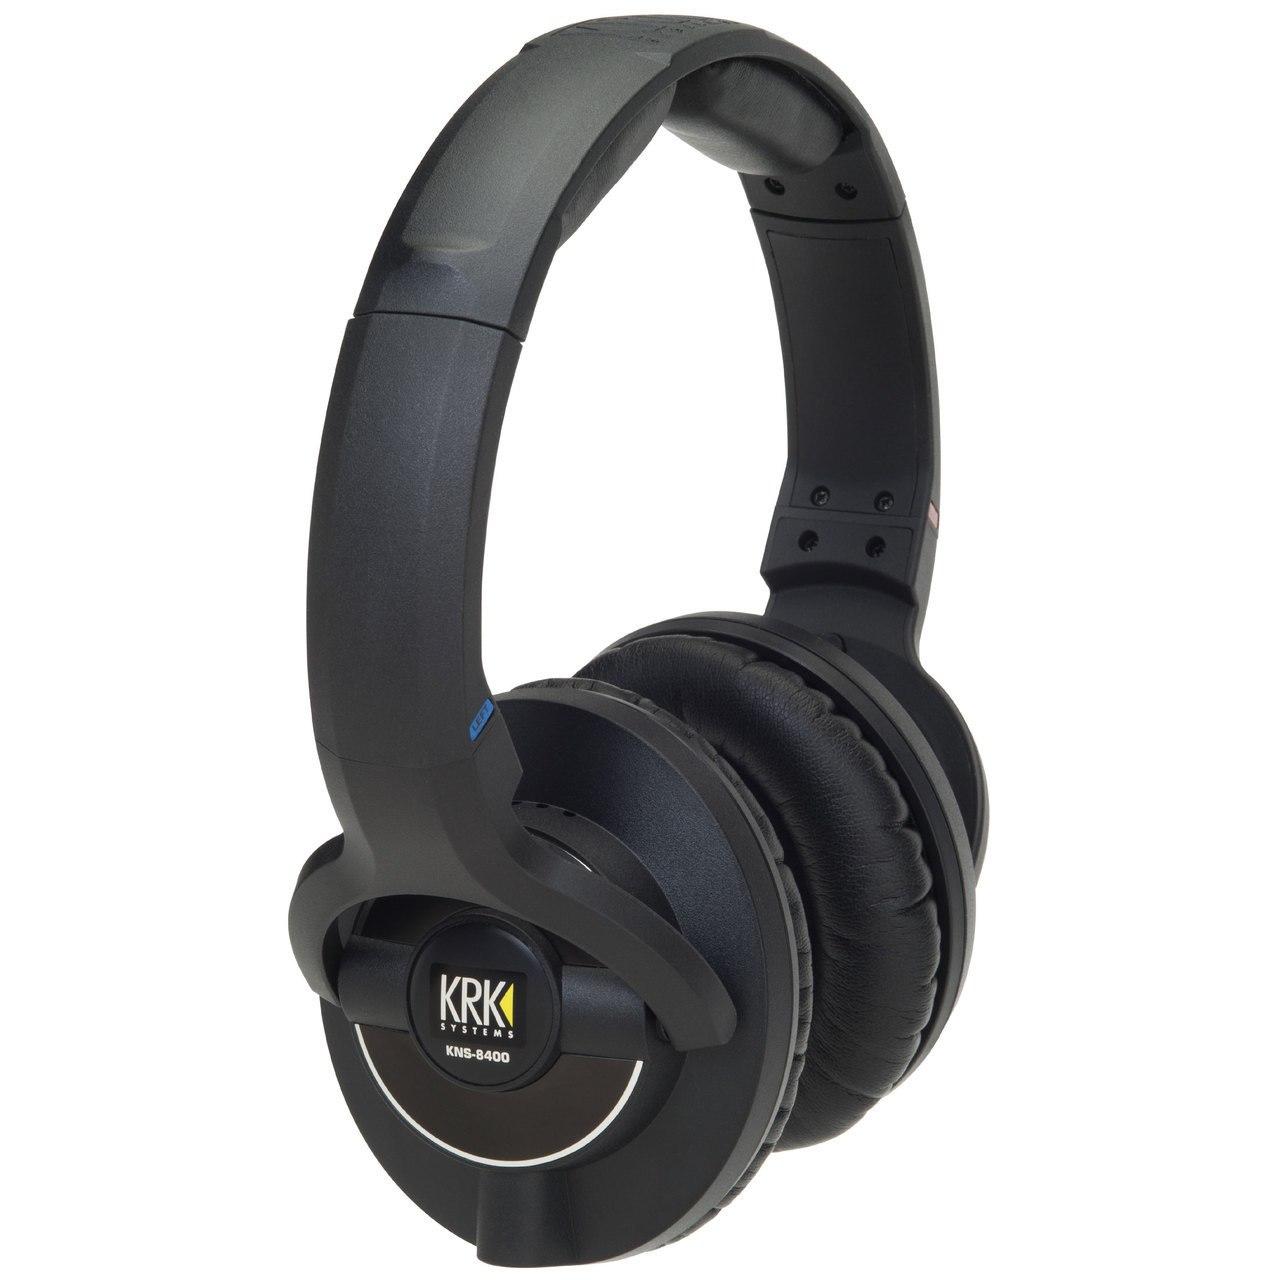 KRK KNS 8400 Studio Monitoring Headphones